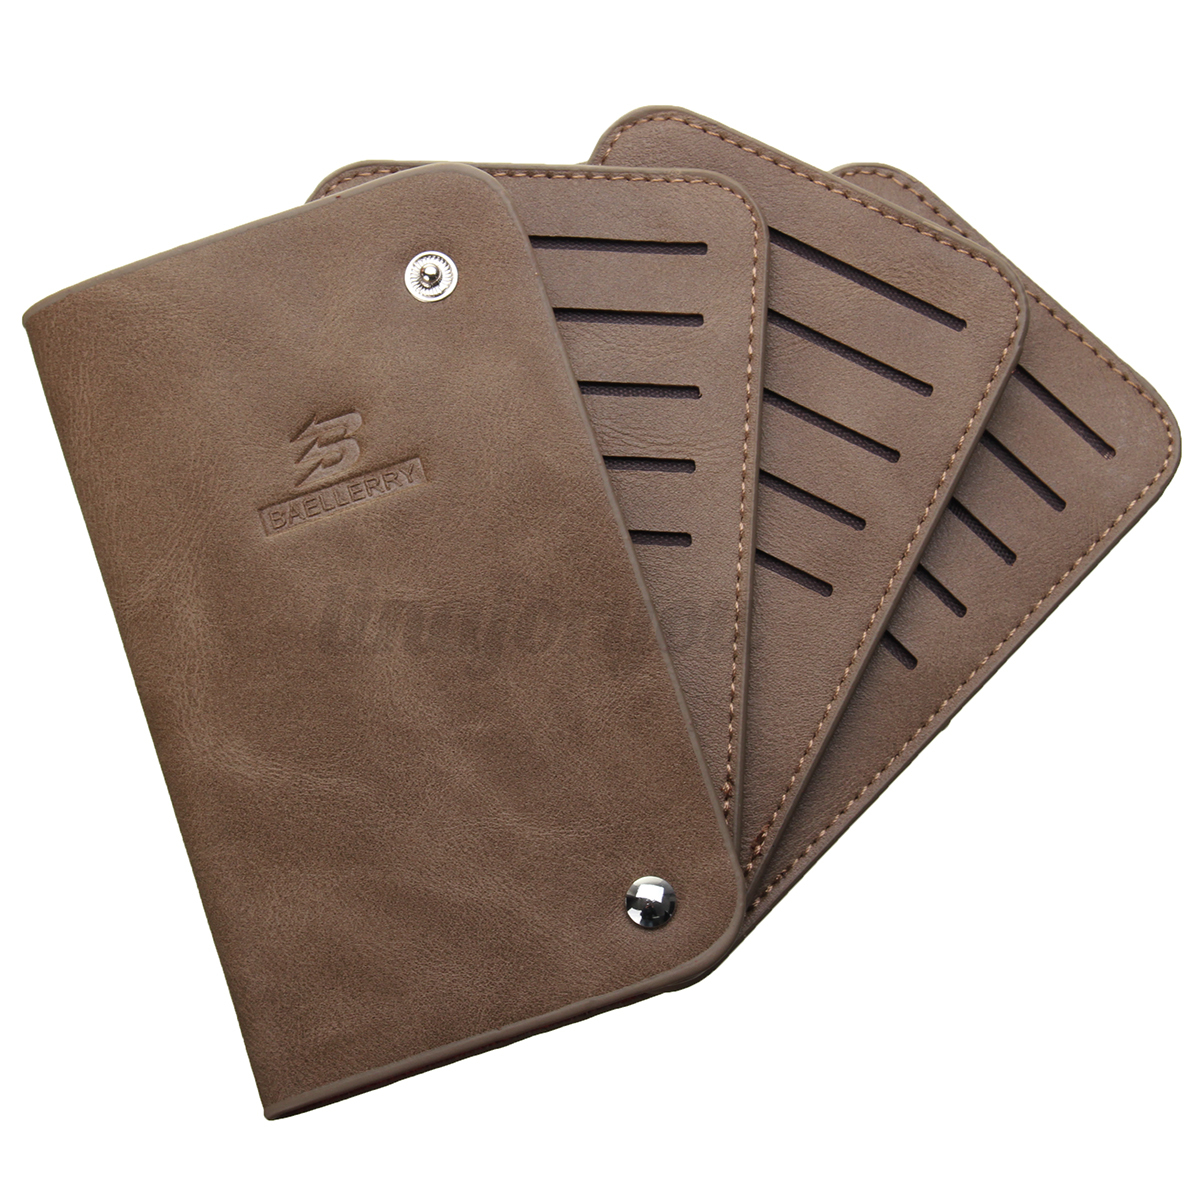 Unisex Card Holder Case Buckle Leather PU Lady Credit Card Purse Wallet Pocket